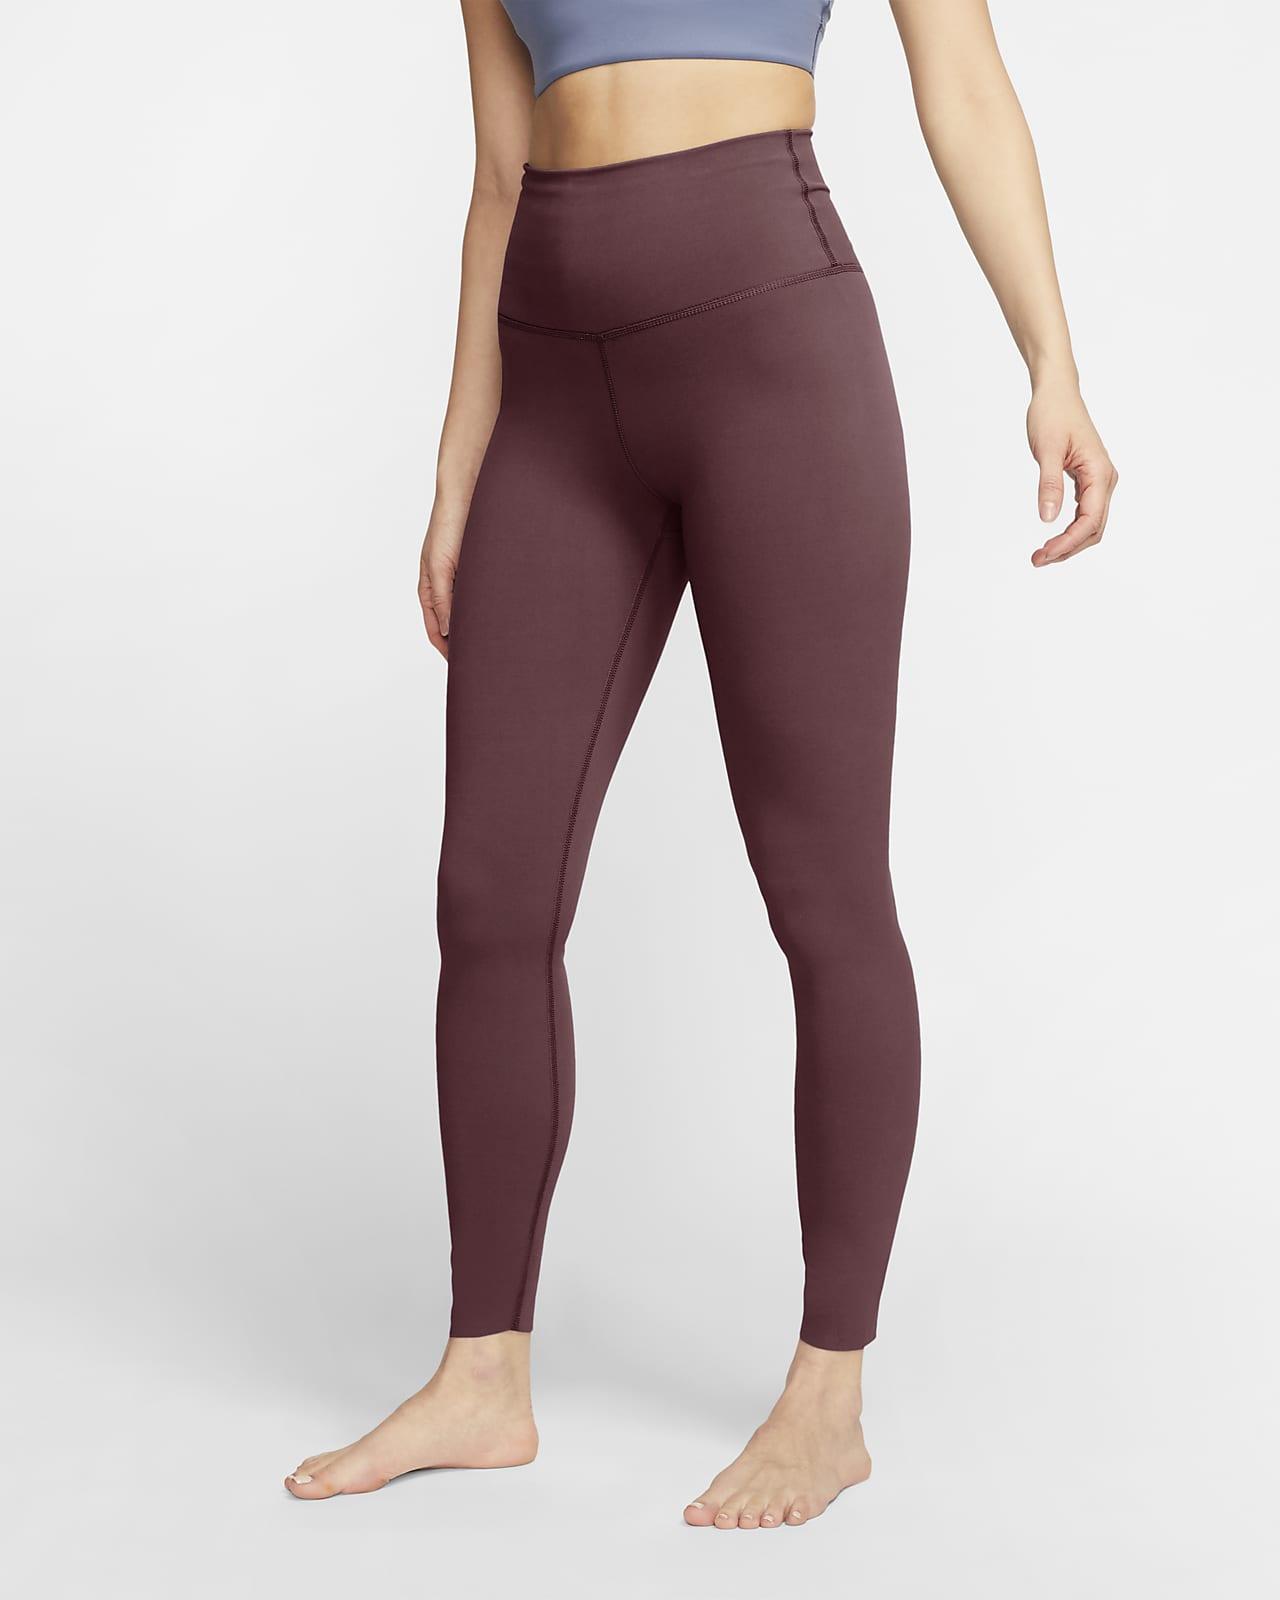 Nike Yoga Luxe Women's Infinalon 7/8 Leggings